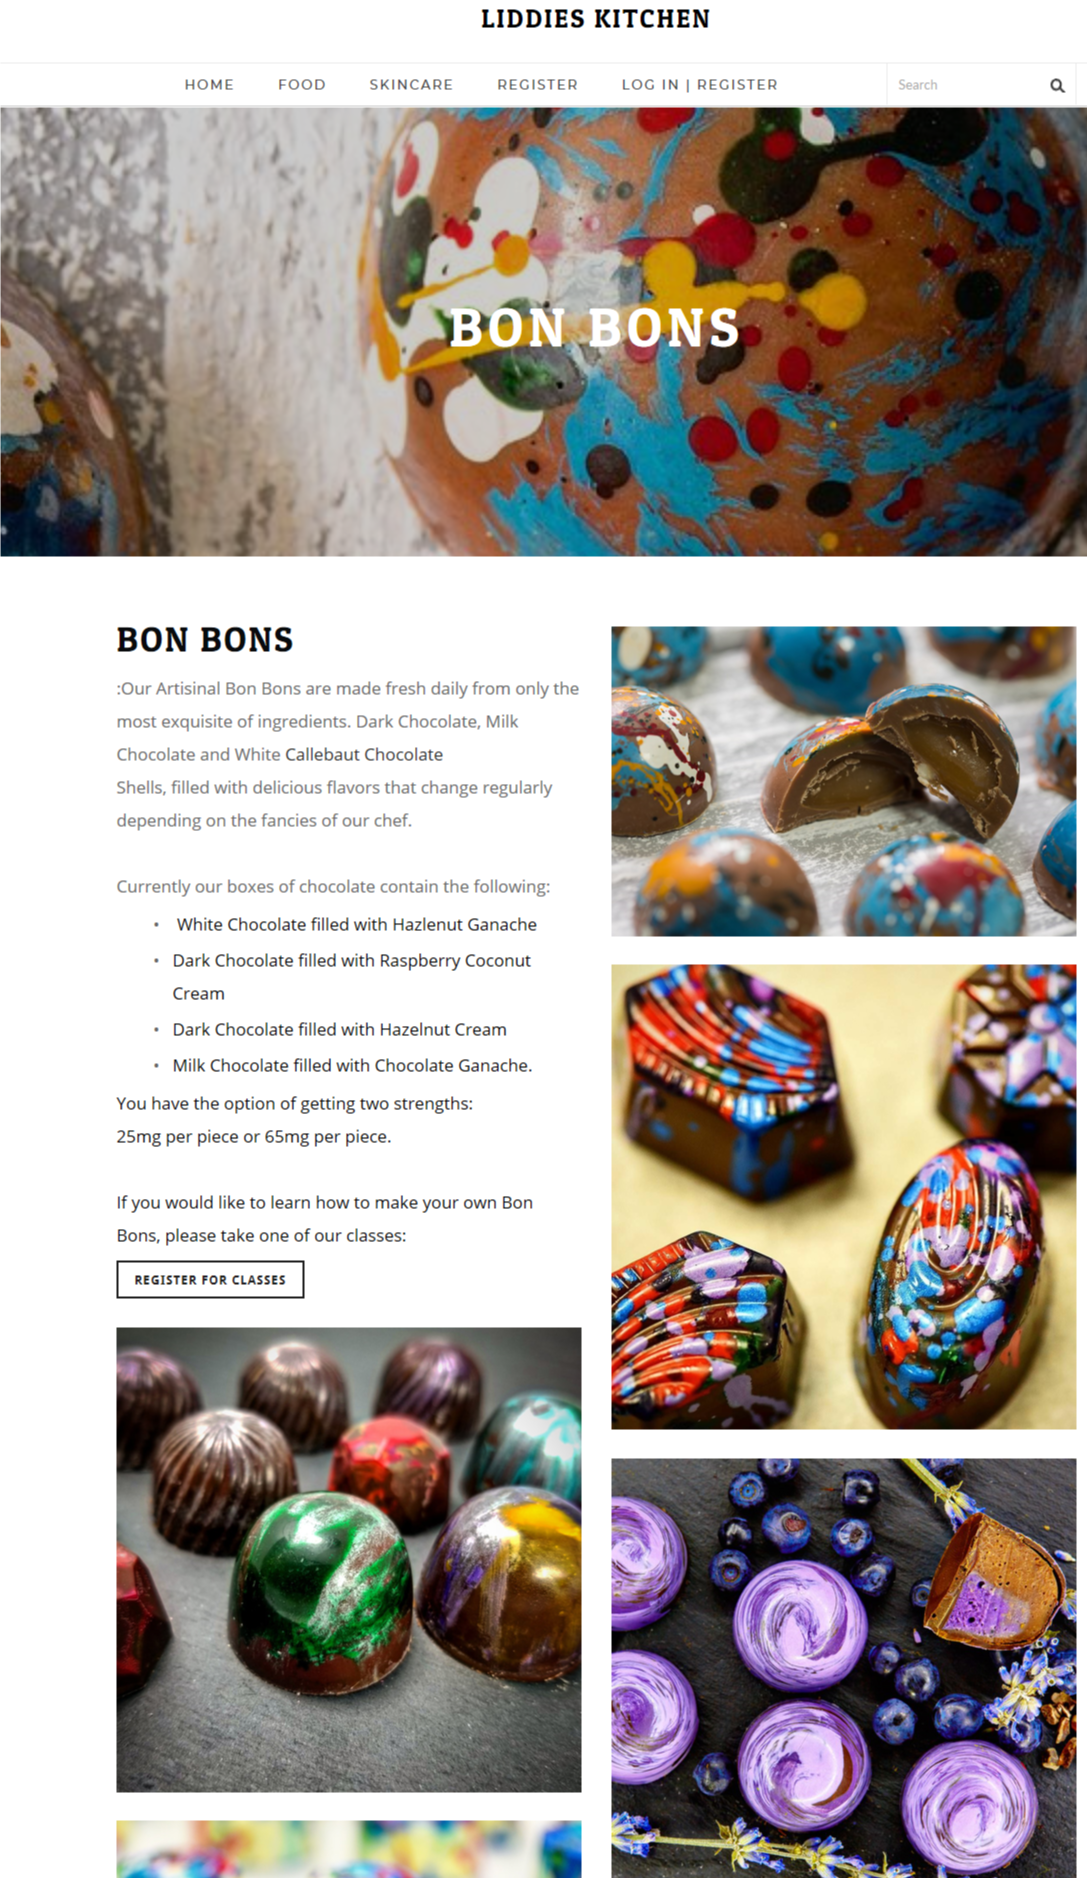 bon-bons-website-screenshot.png